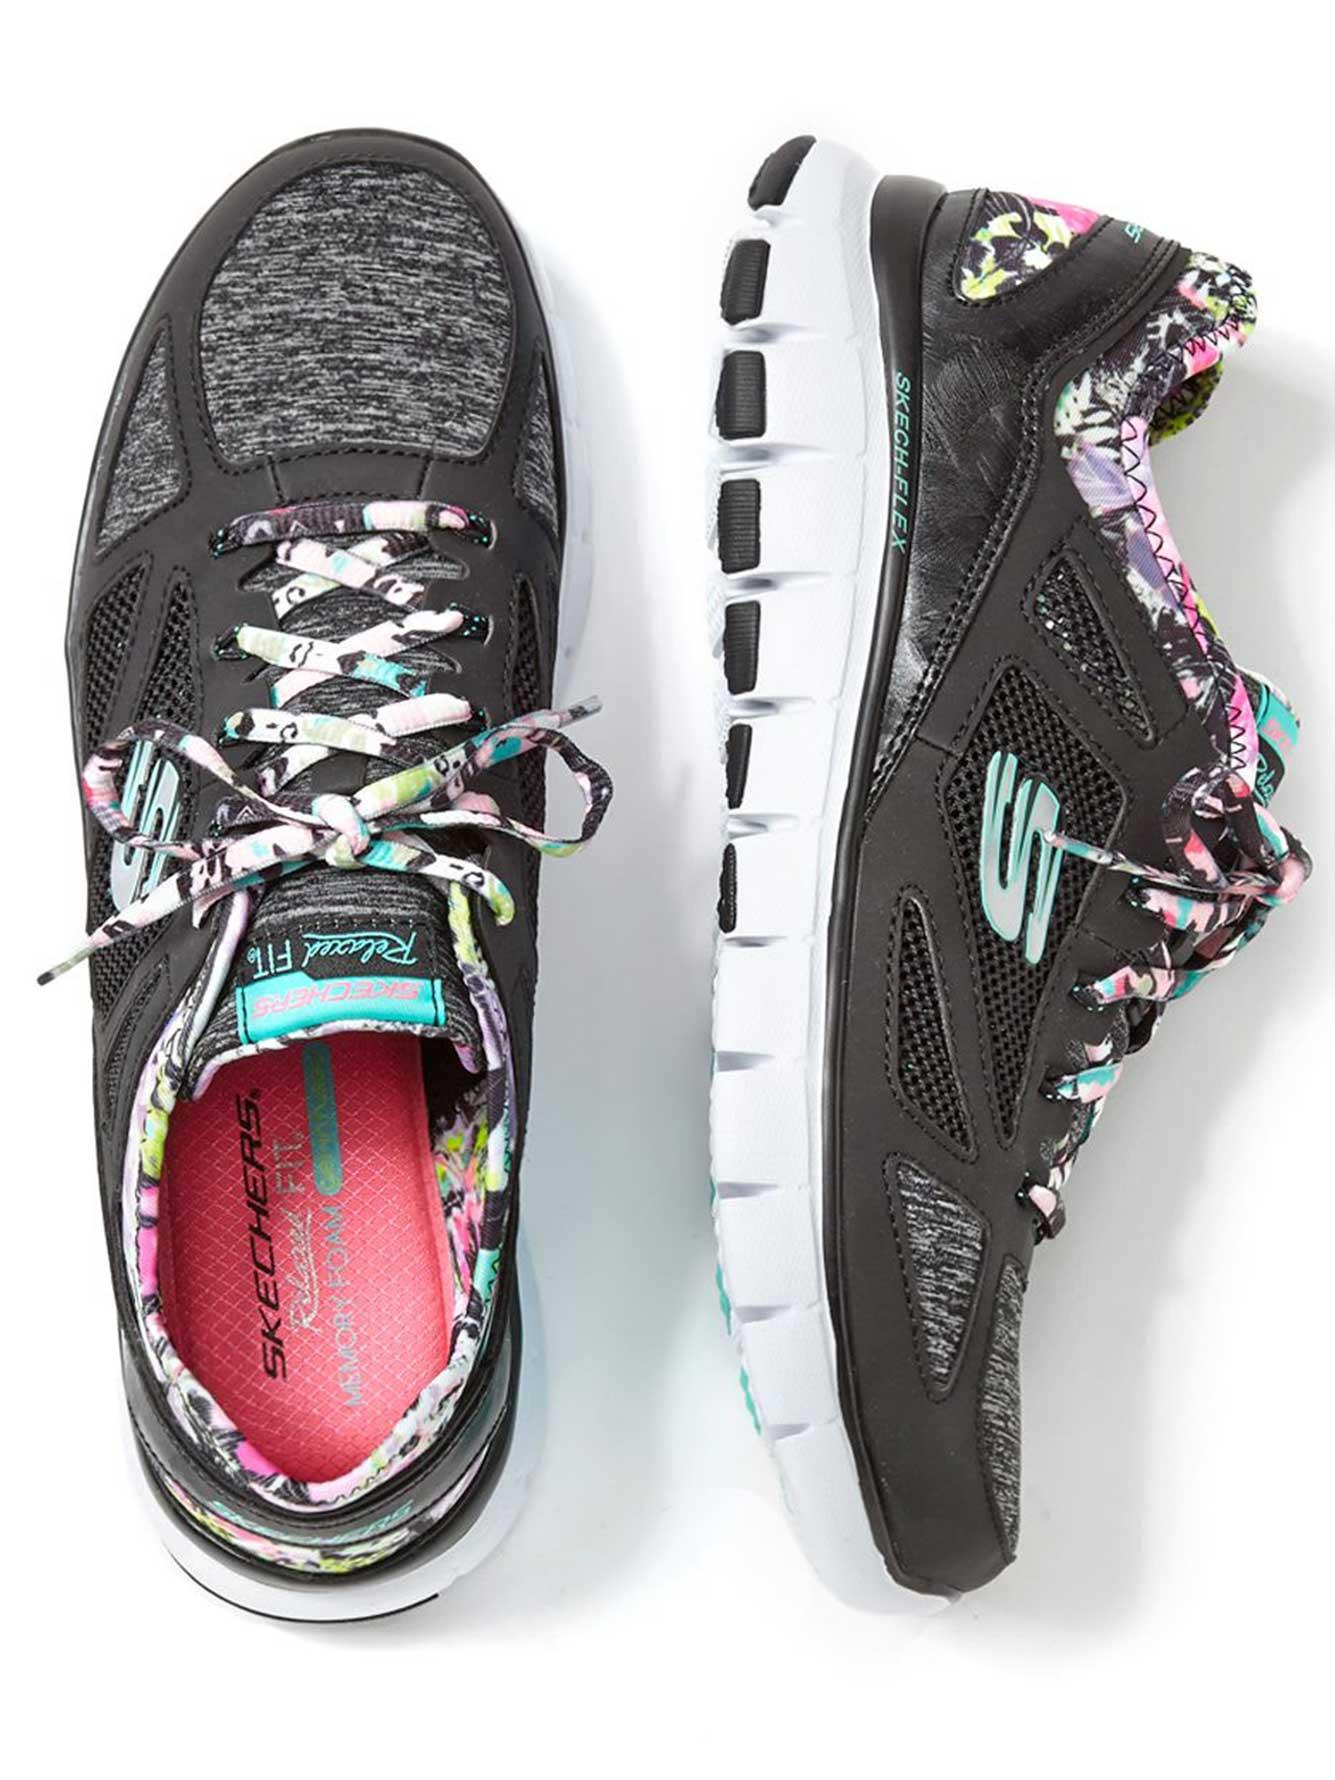 5858a4888431 Skechers Wide-Width Lace Up Sneakers